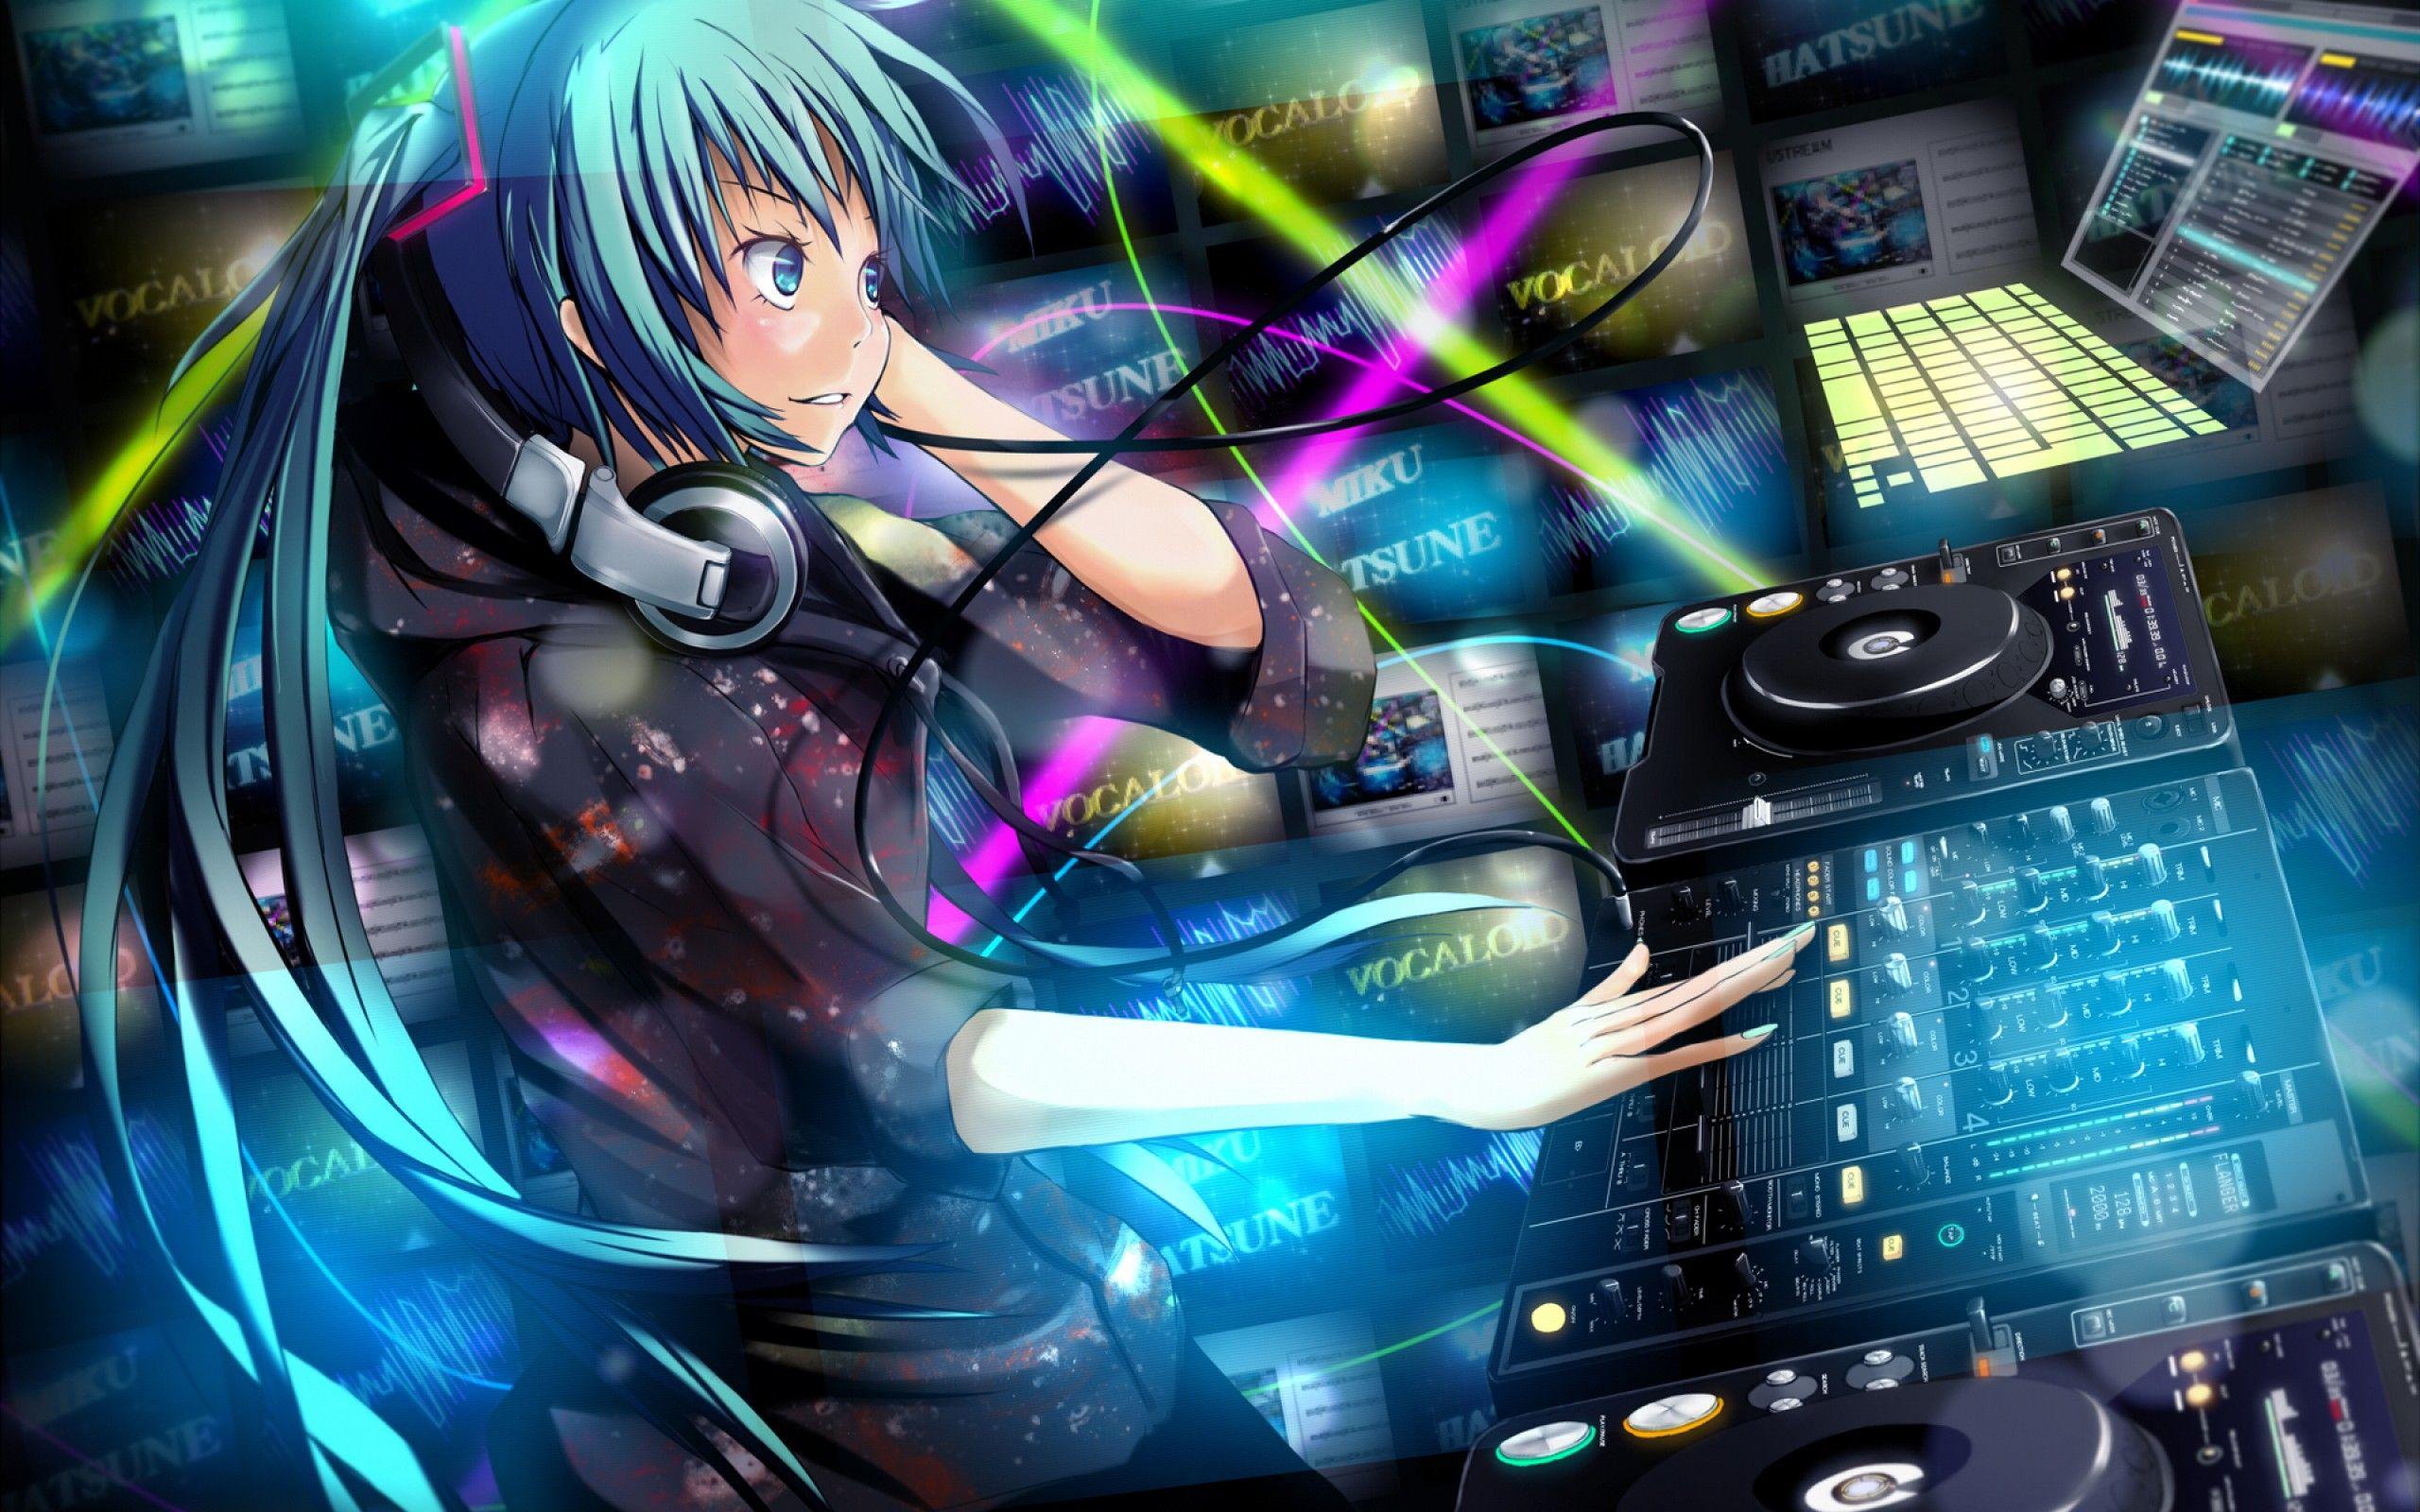 Top 10 Nightcore Songs Imgur Hatsune Miku Miku Anime Wallpaper Anime headphones iphone wallpaper